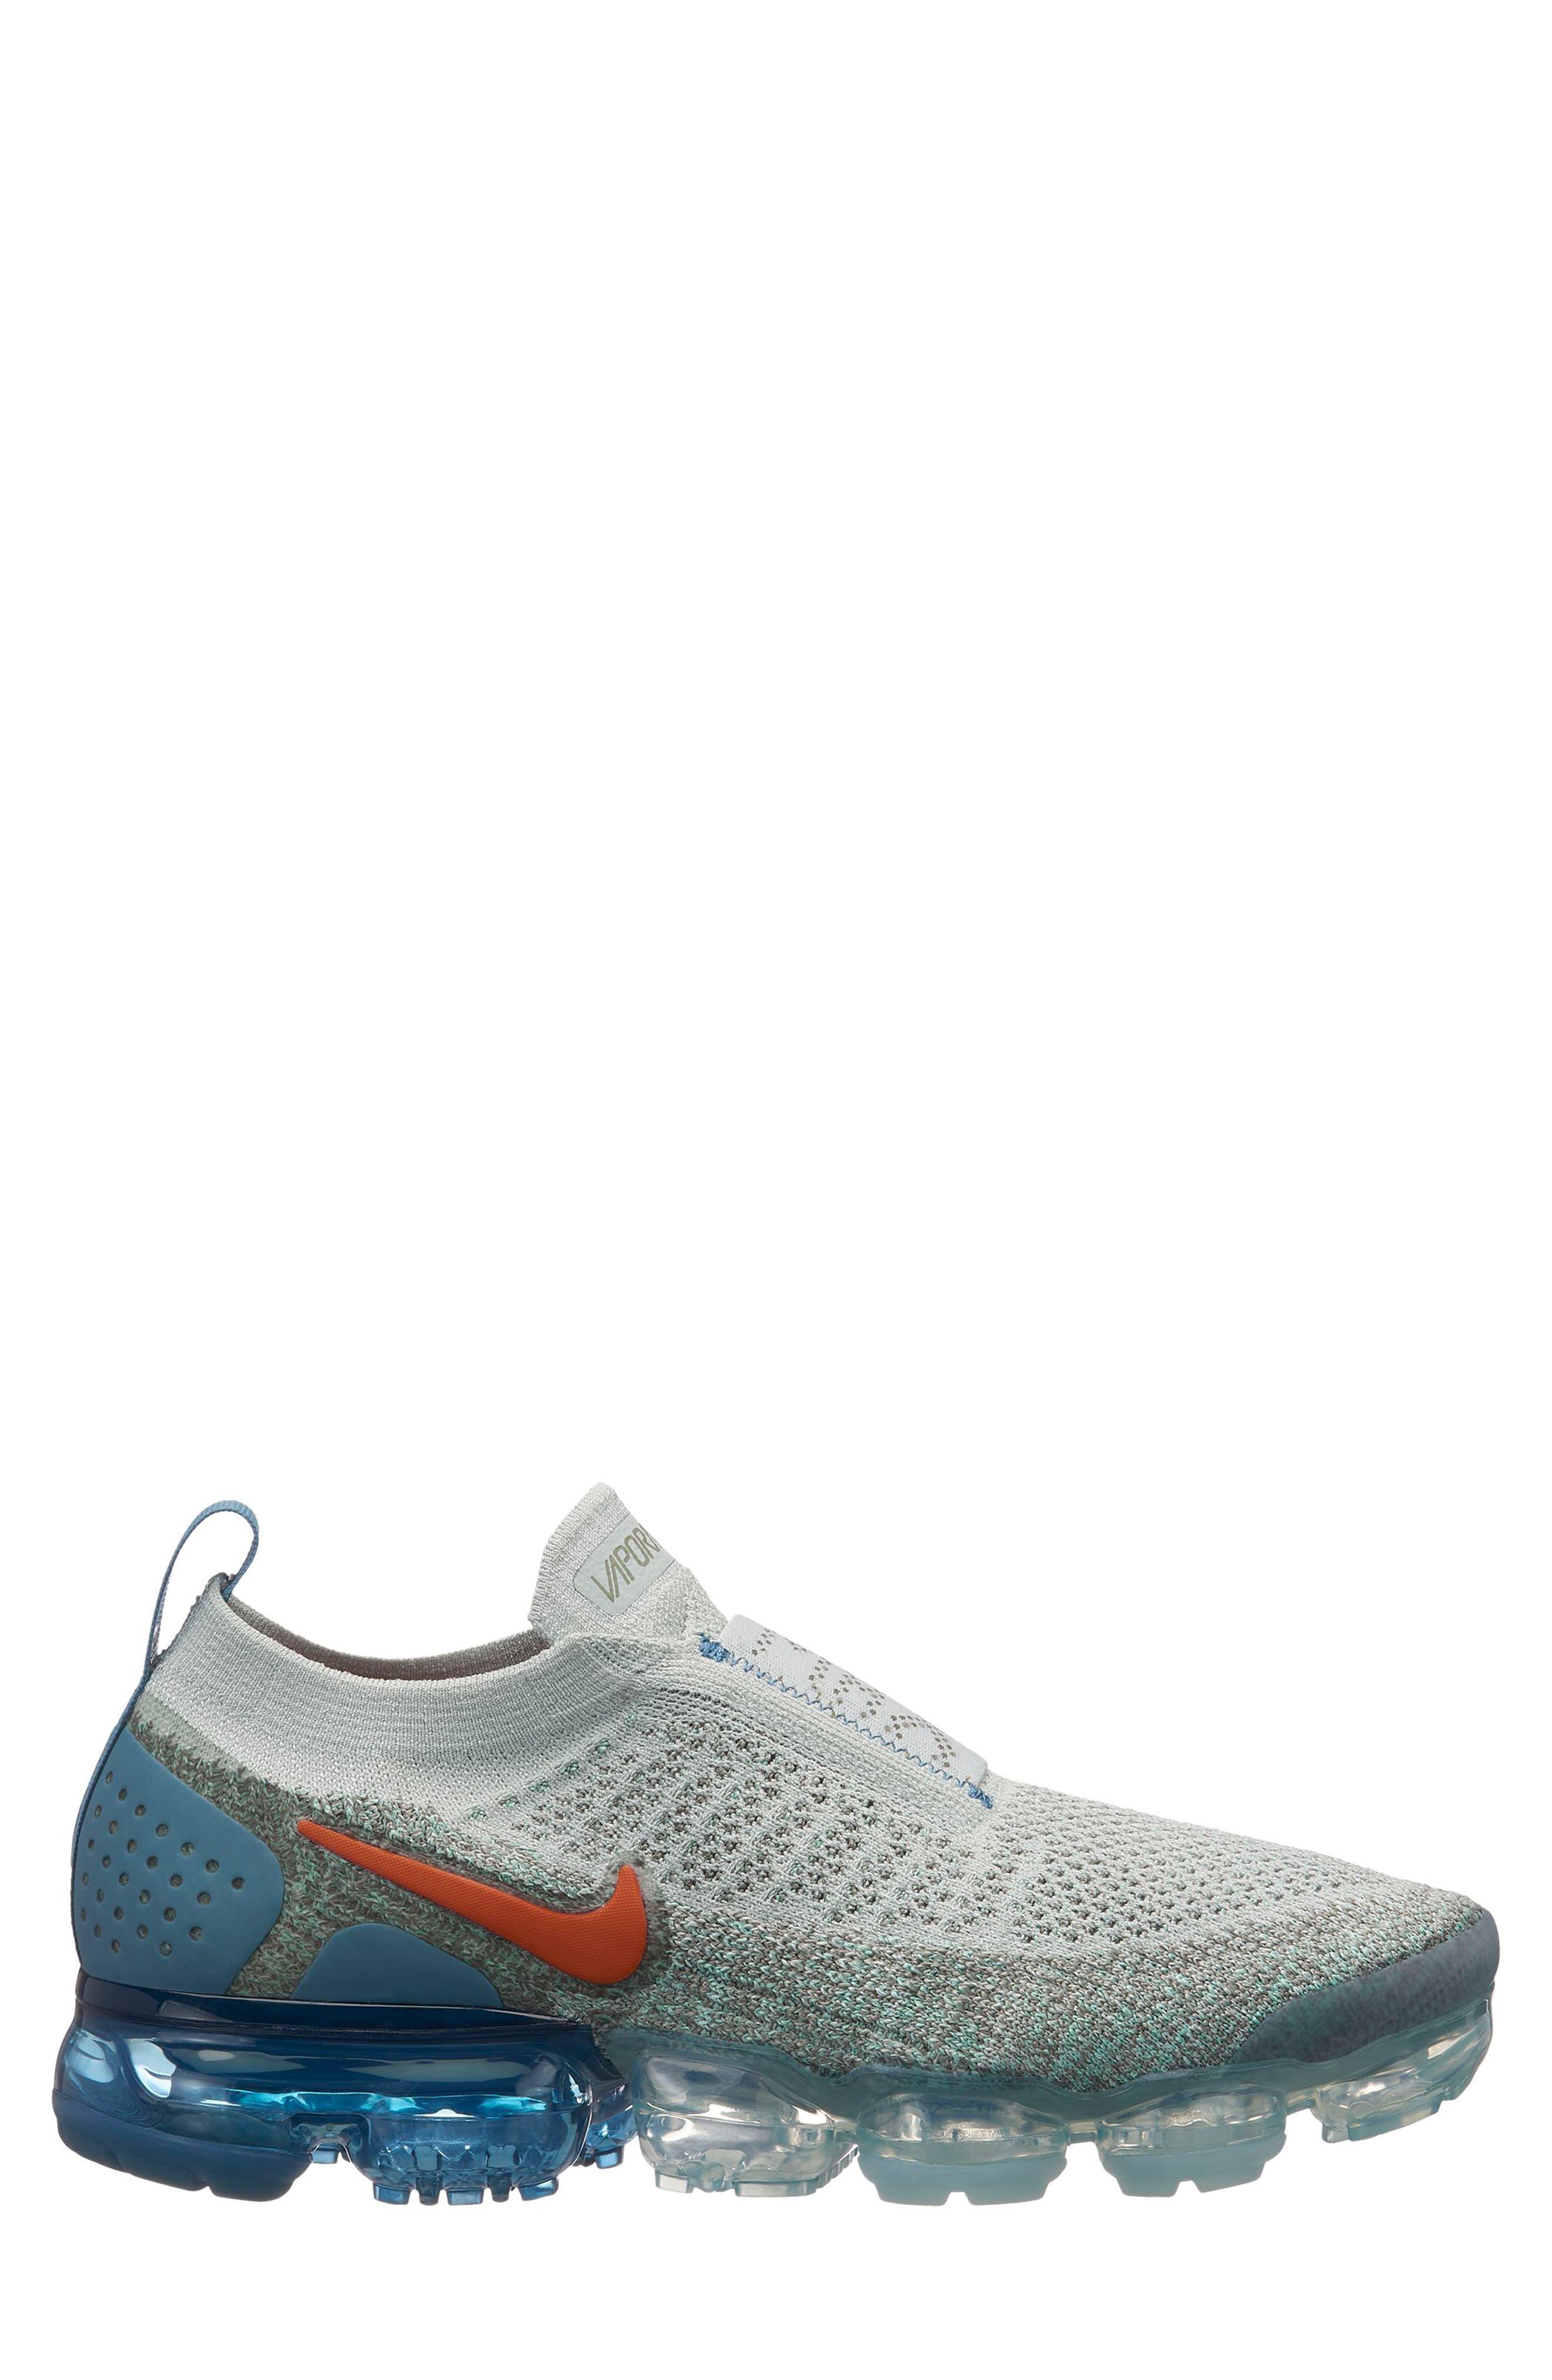 Air VaporMax Flyknit MOC 2 Running Shoe,                             Main thumbnail 1, color,                             SILVER/ CAMPFIRE ORANGE/ BLACK